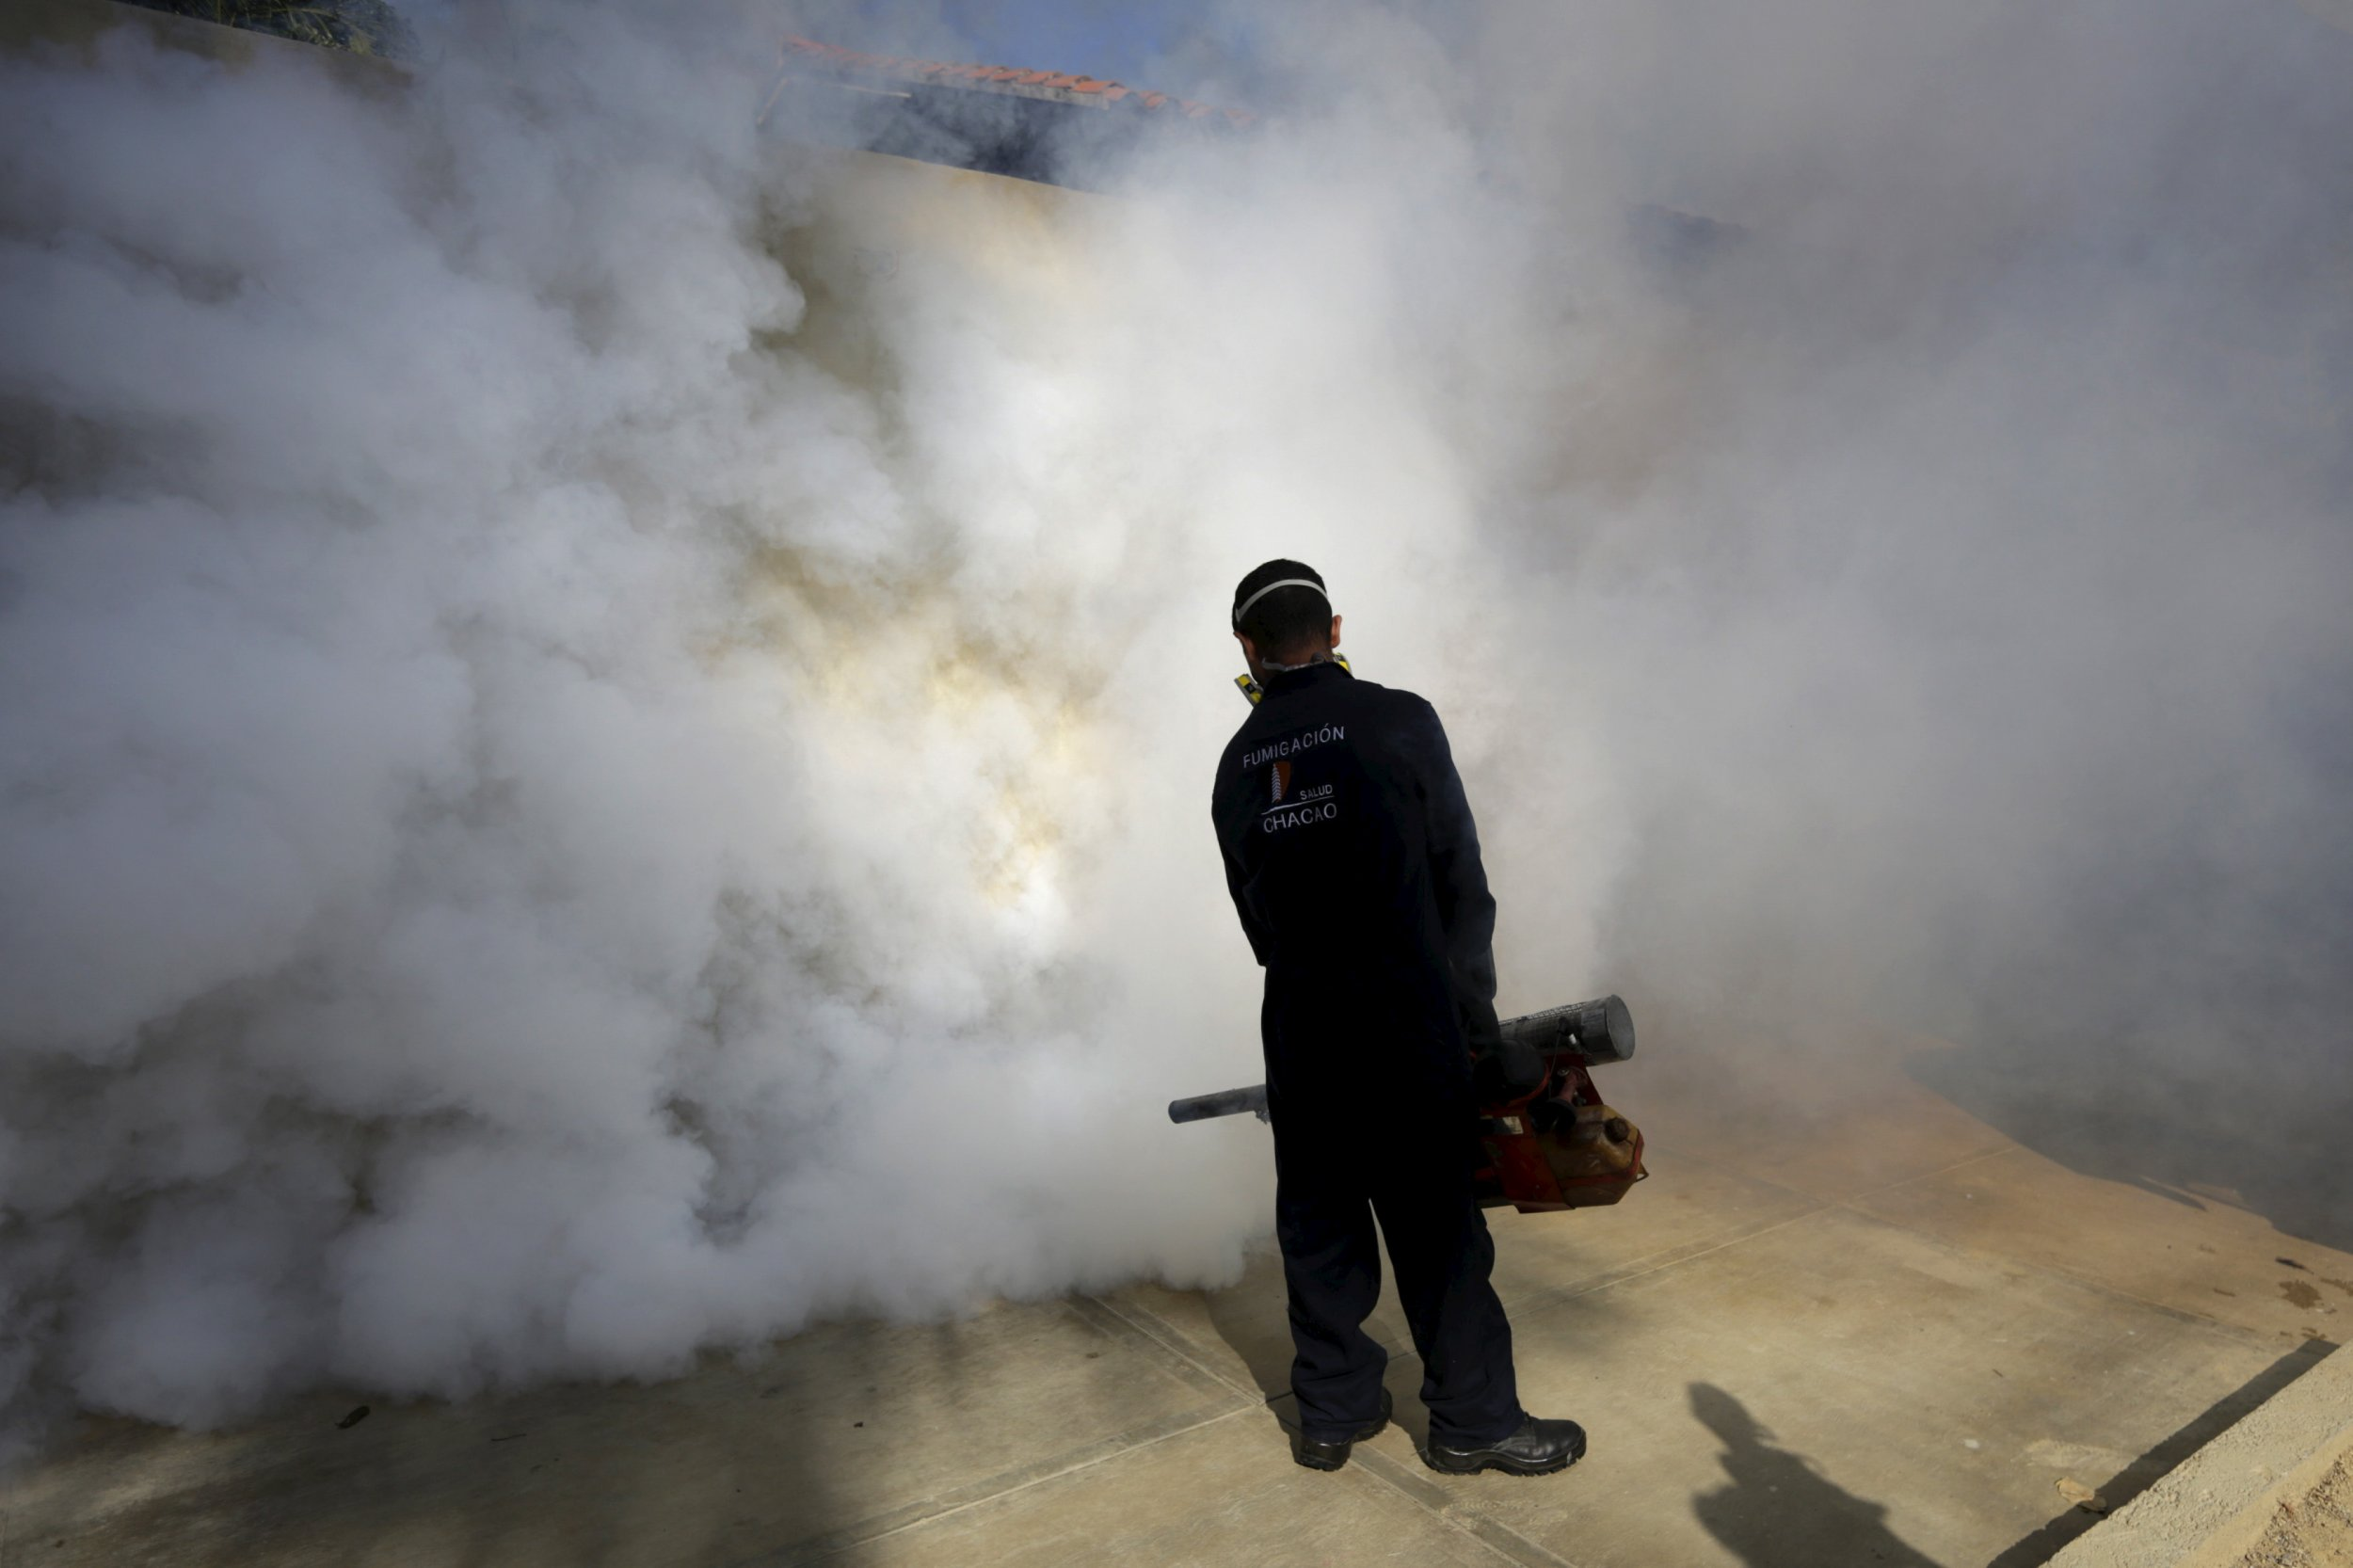 0201_Zika_Virus_SouthAmerica_UN_01